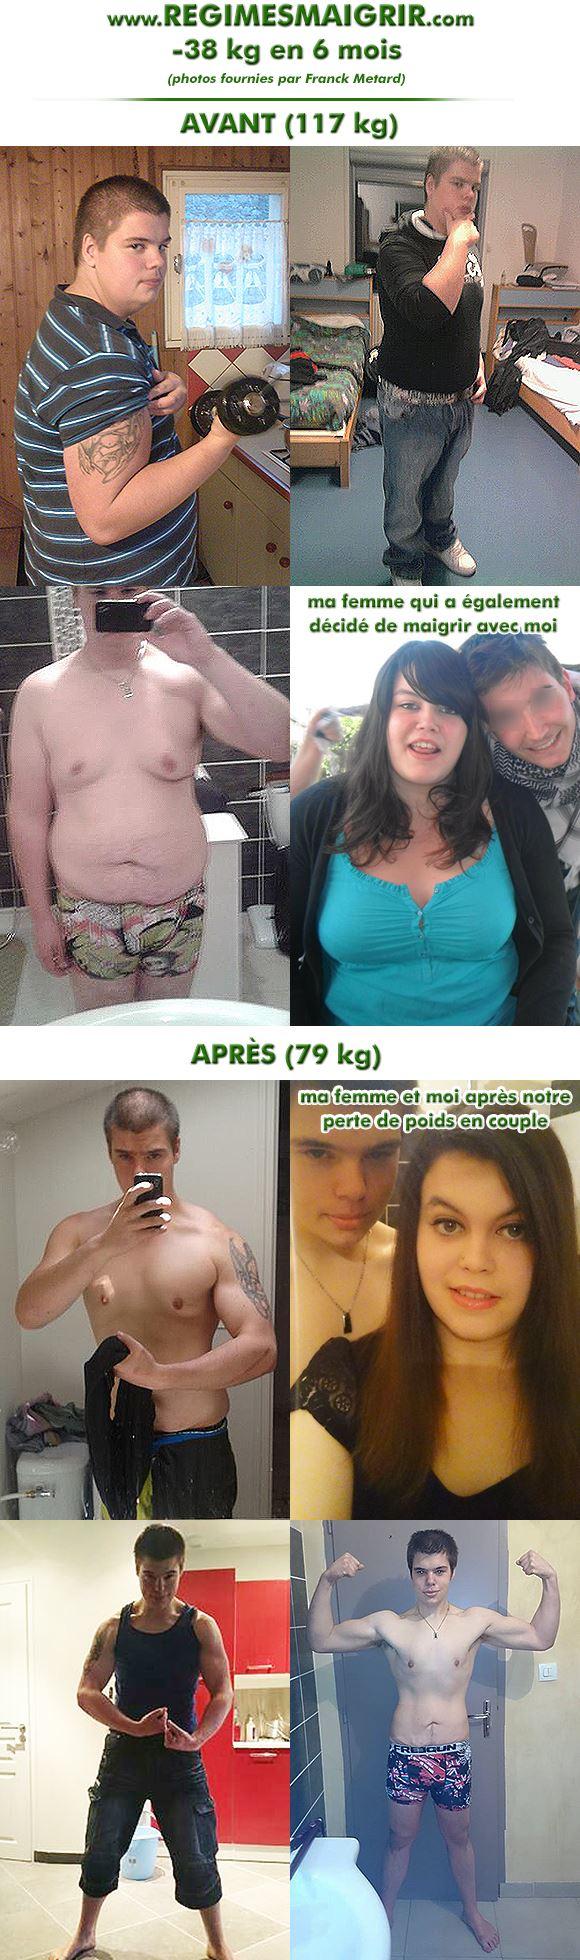 Franck Metard a perdu trente huit kilogrammes en six mois et sa femme seize kg